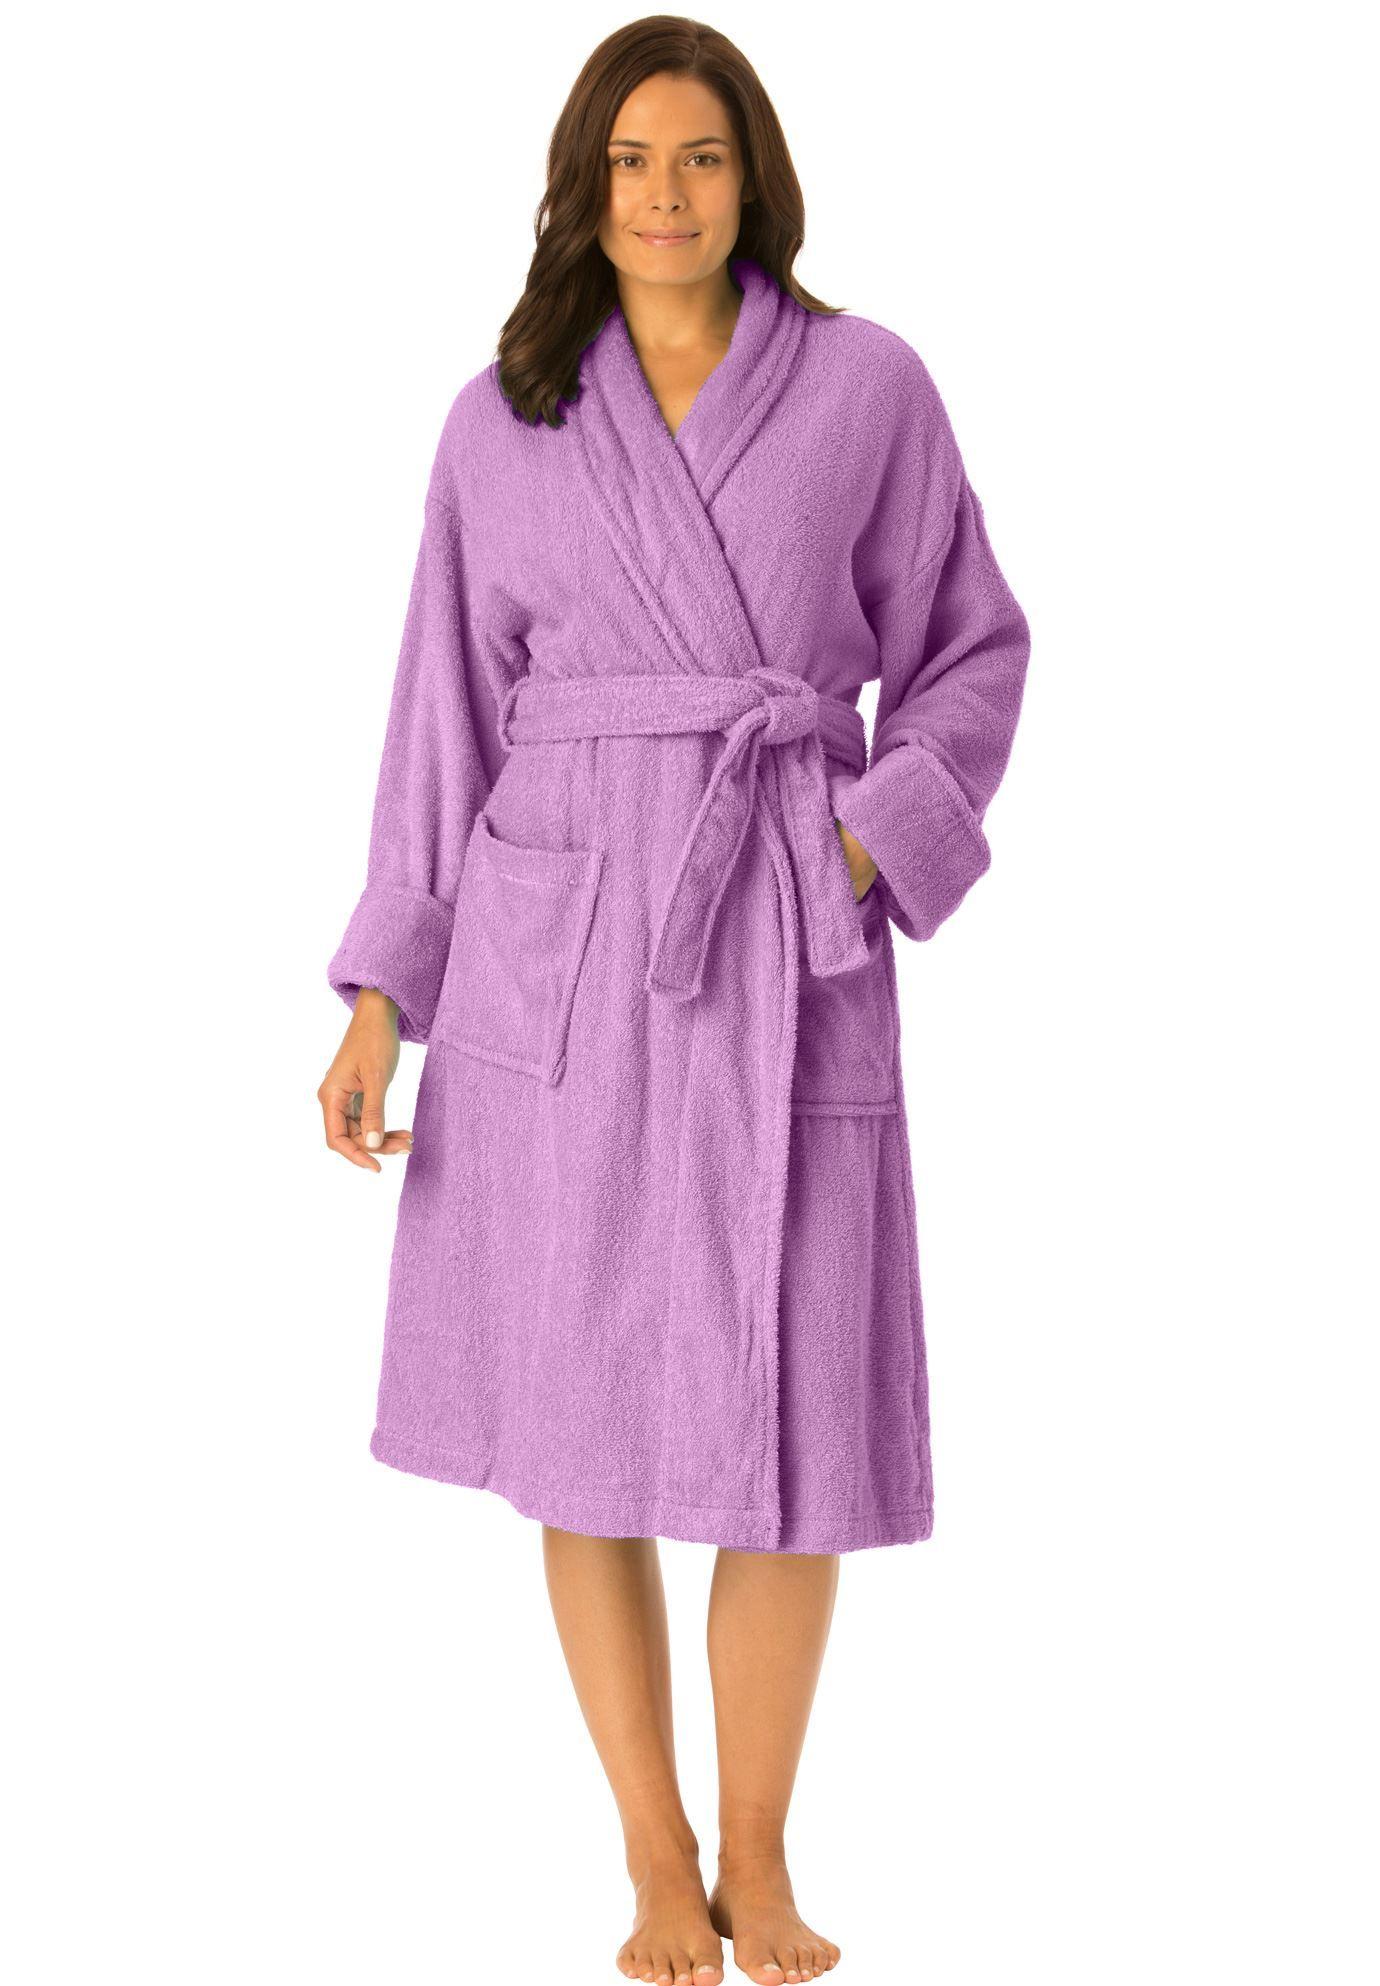 829e8925c8 This short terry robe has a pretty